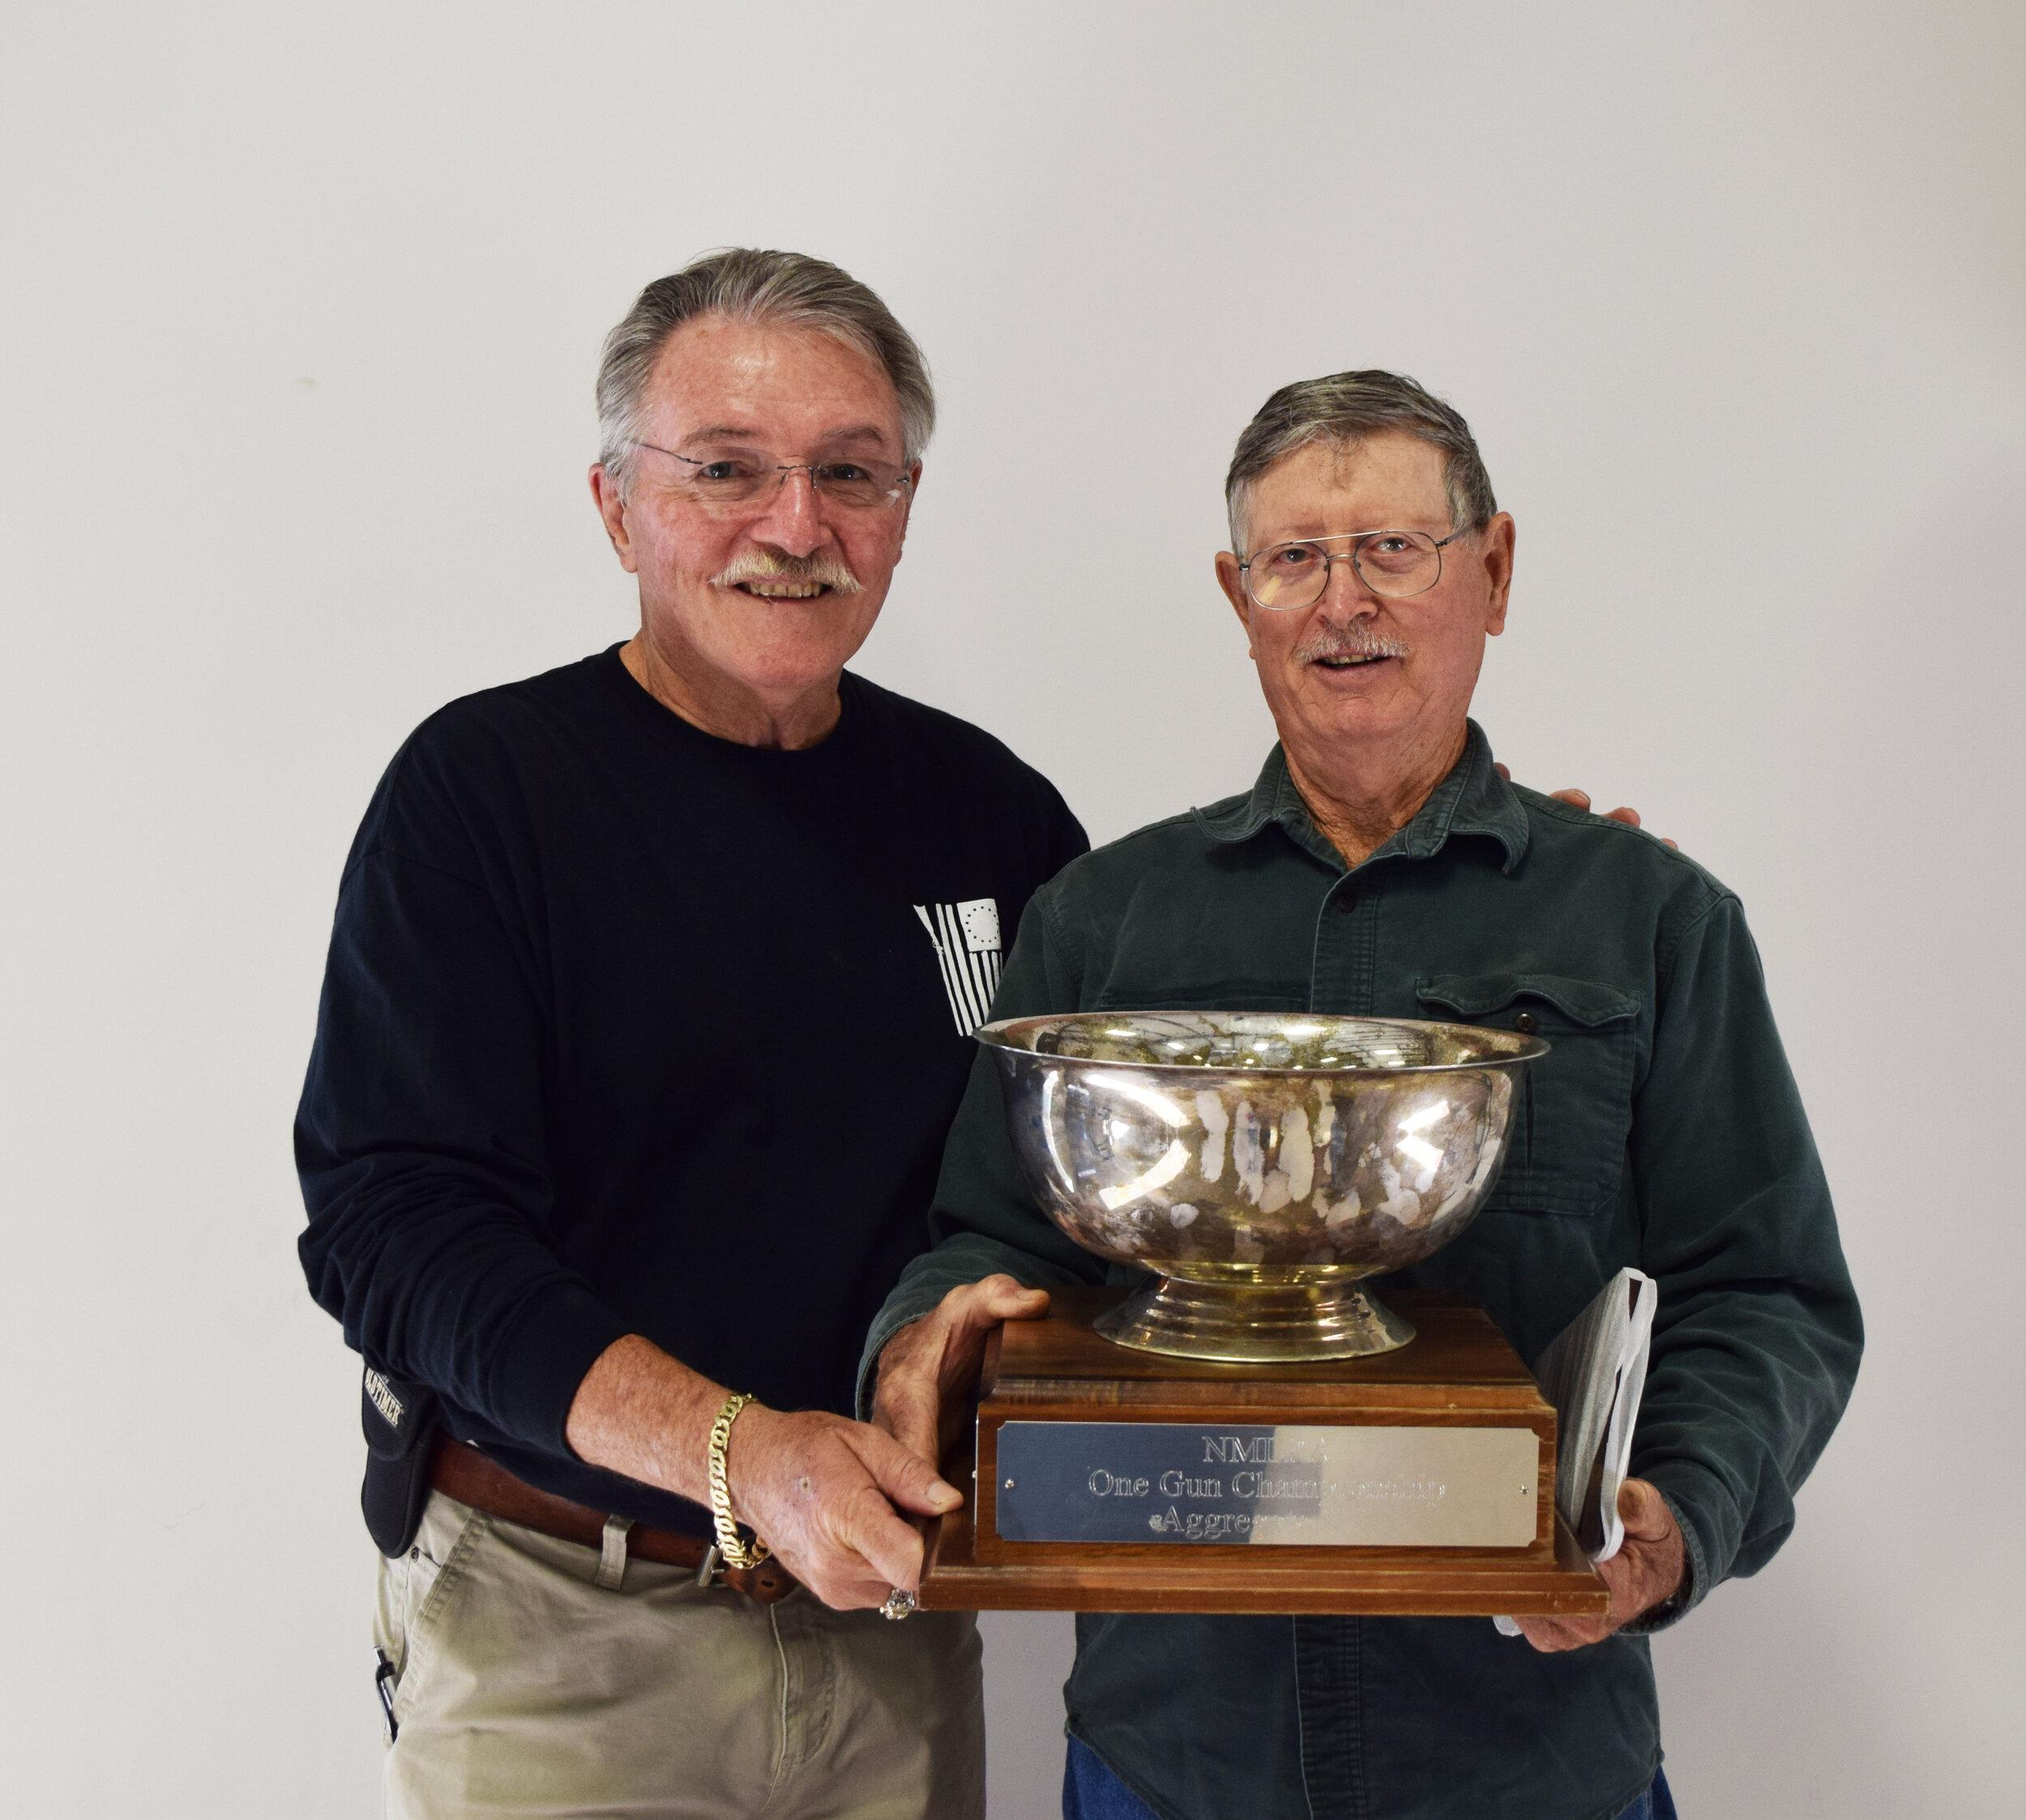 J.L. Hargis - Aggregate KK - One Gun Championship Winner with NMLRA President Brent Steele